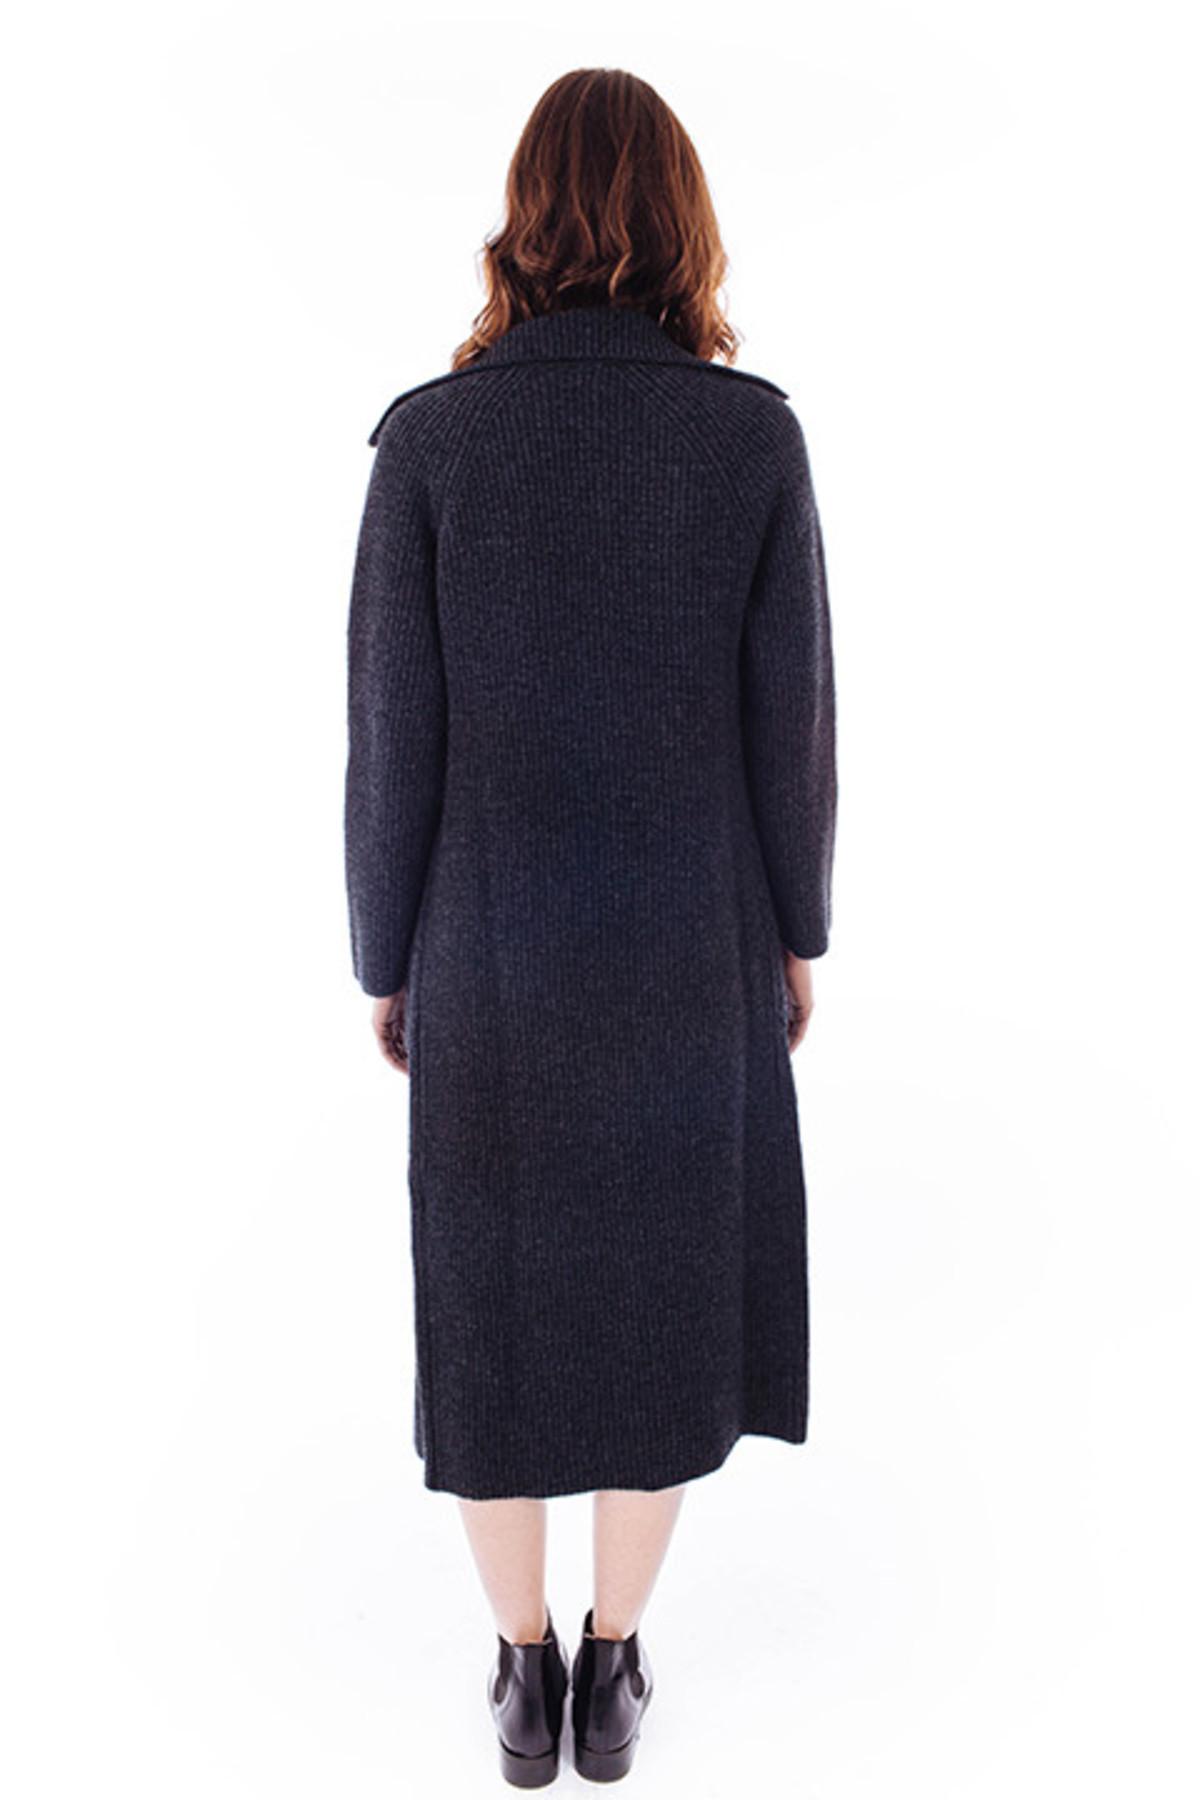 ACHRO Ribbed Sweater Coat in Charcoal | Garmentory